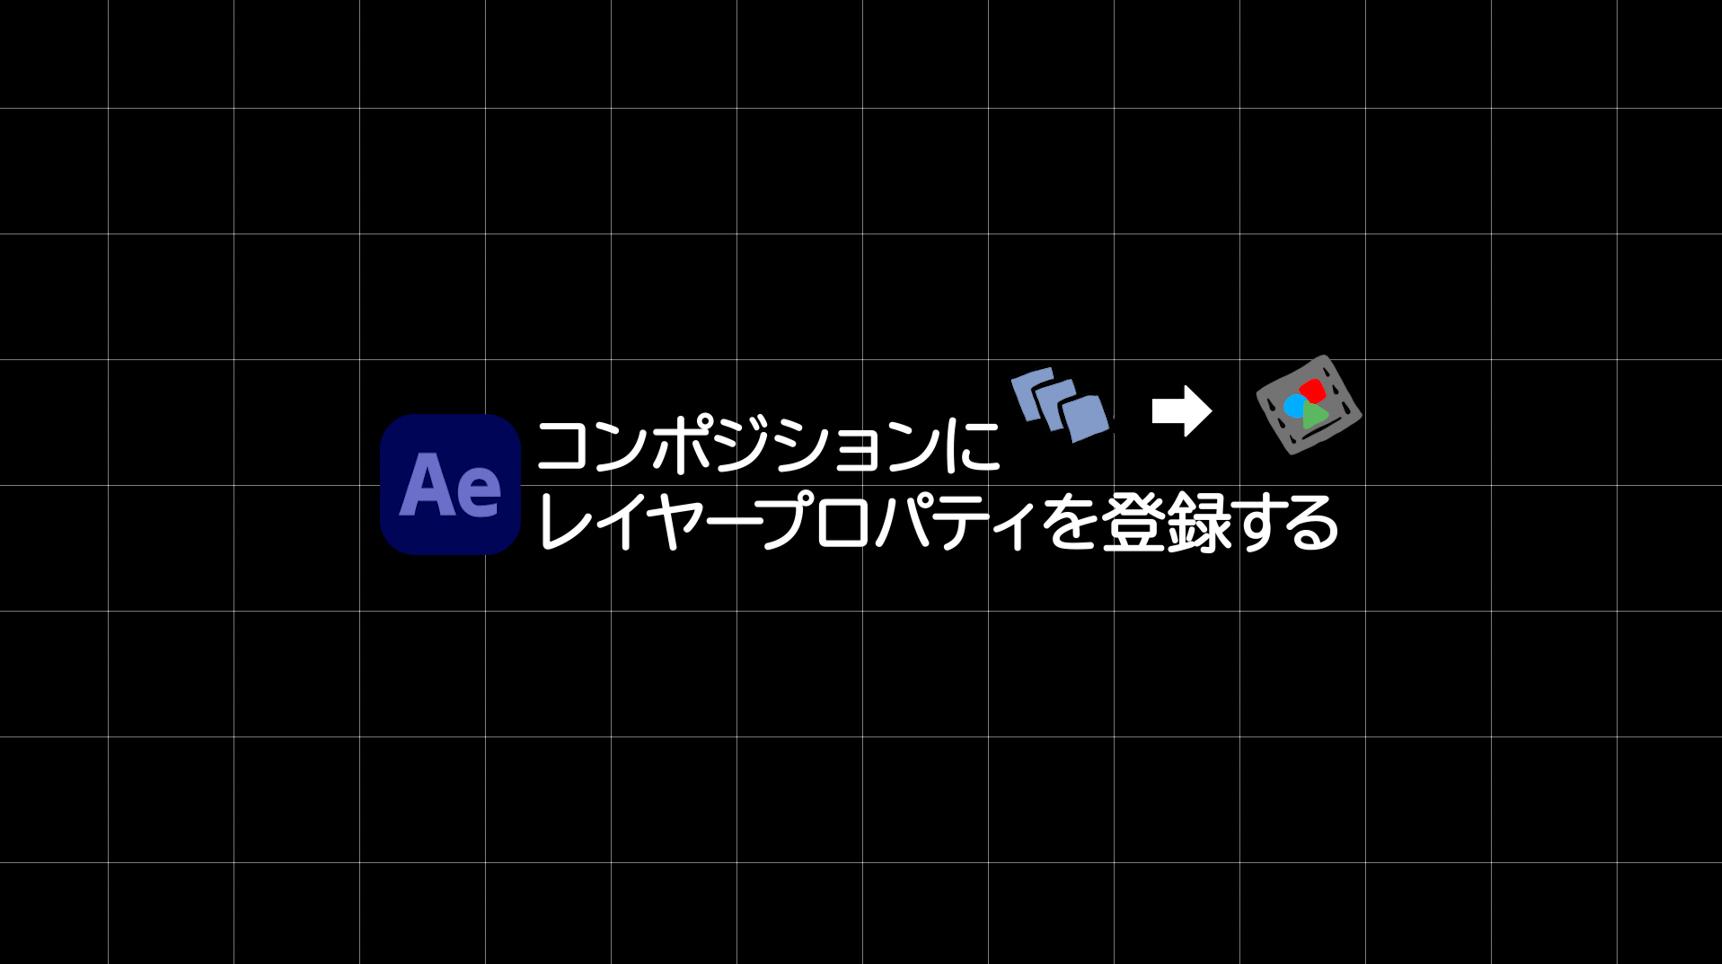 【AE基础】如何快速访问After Effects合成内部的某些属性?(主属性)